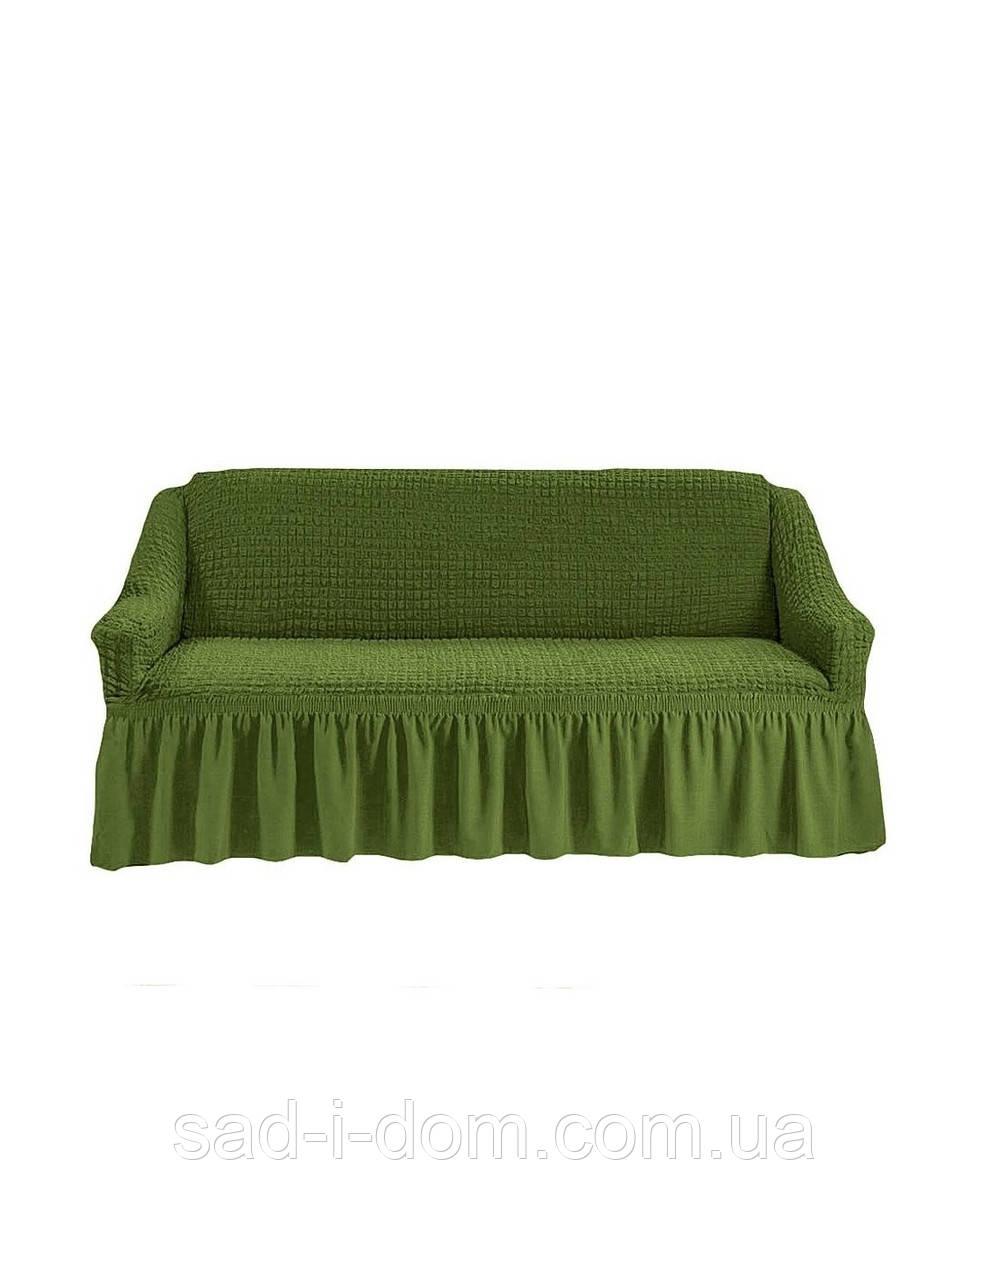 Чехол на 3-х местный диван, оливковый